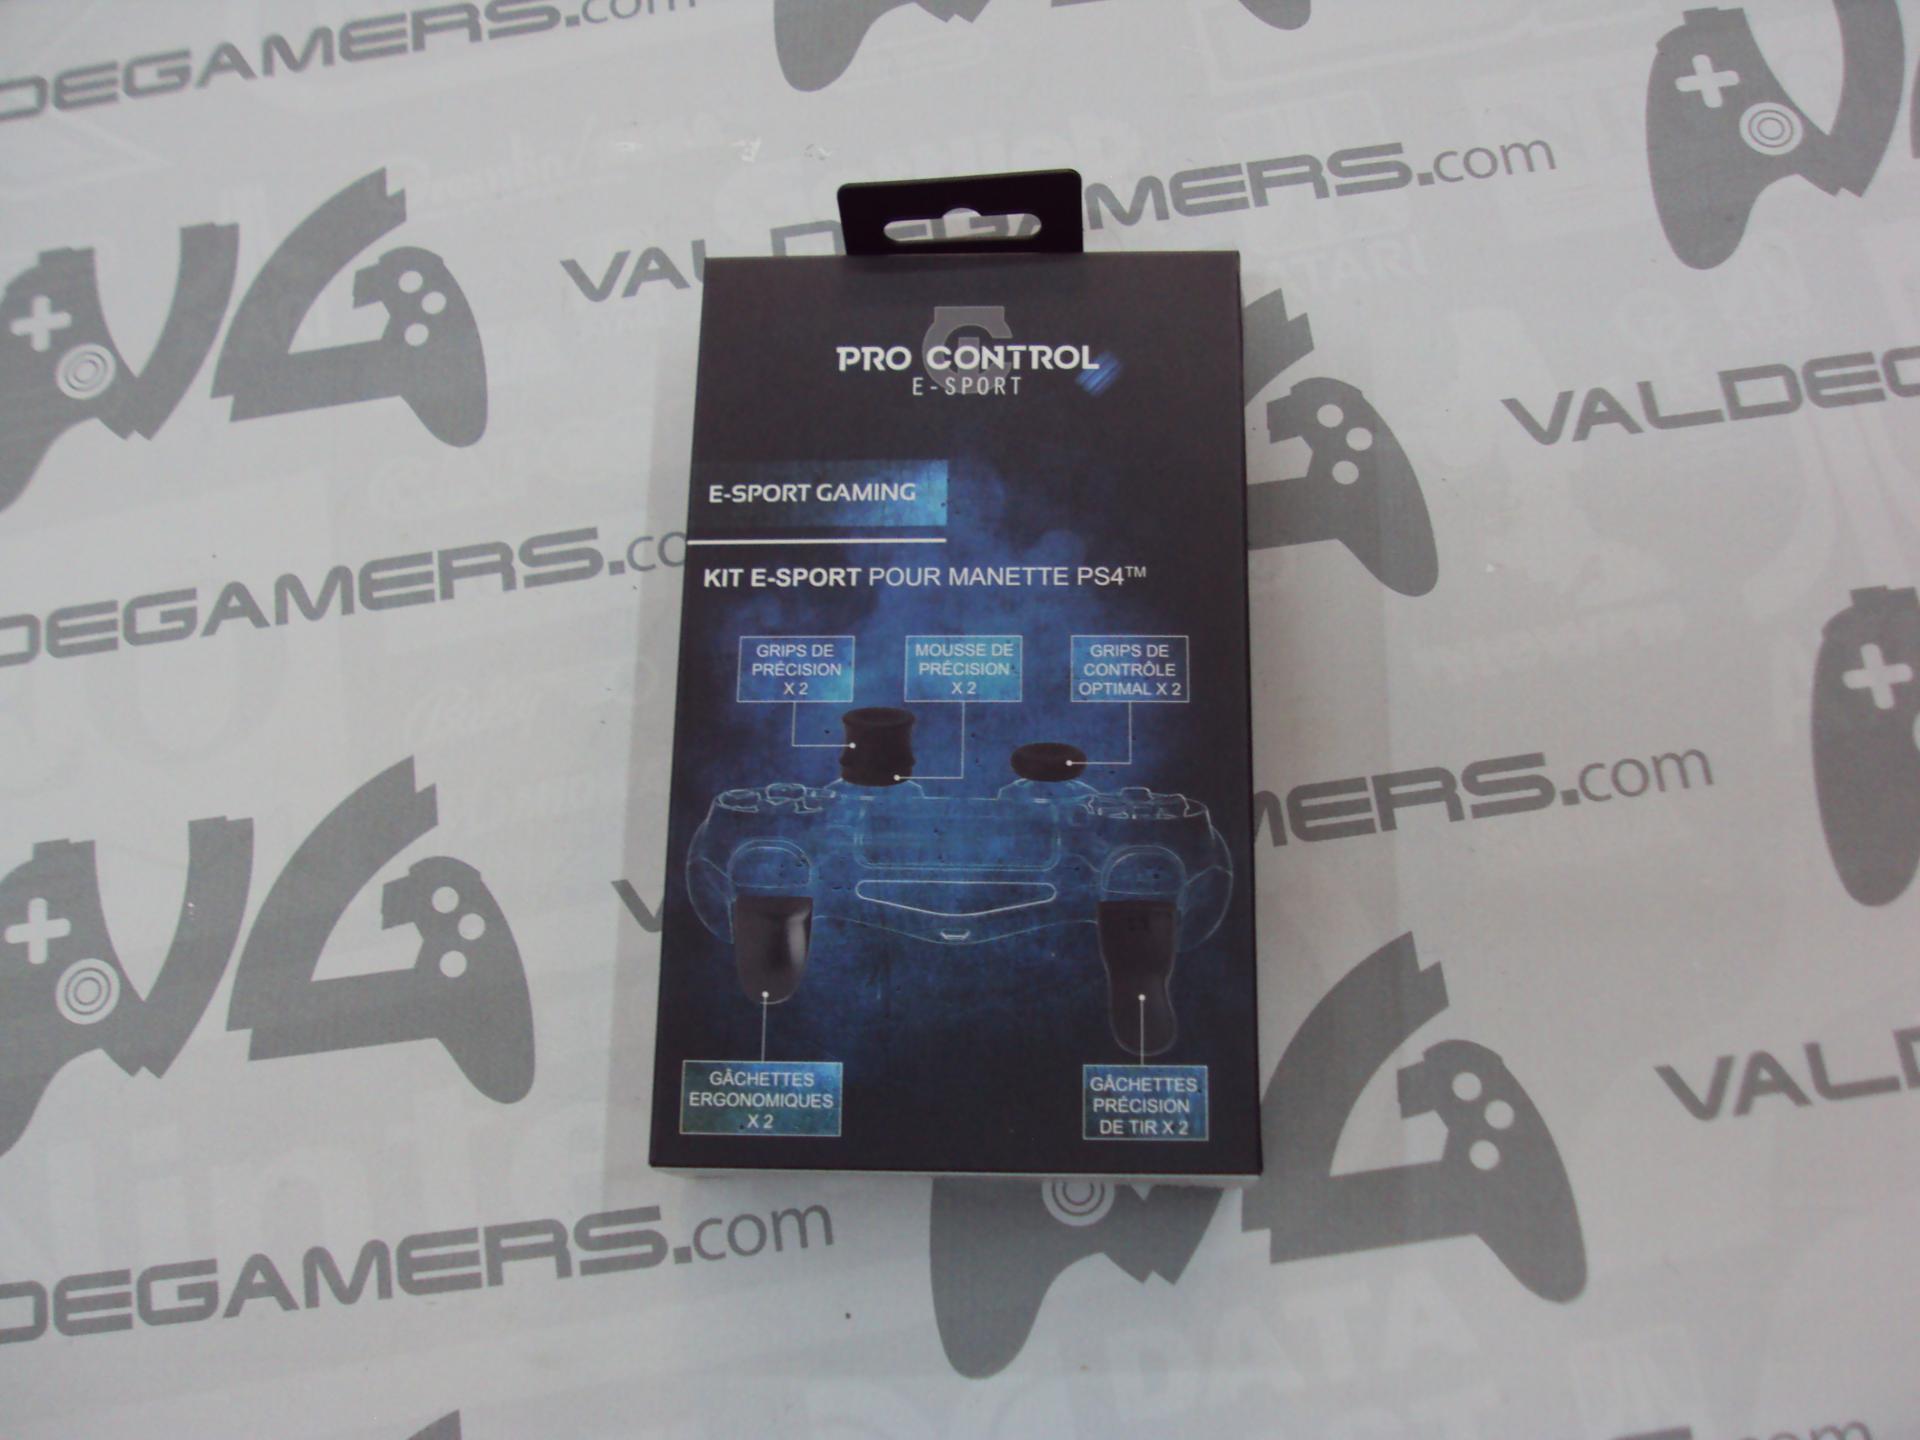 Pro Gaming Kit E-sport Para mando  PS4 - NUEVO